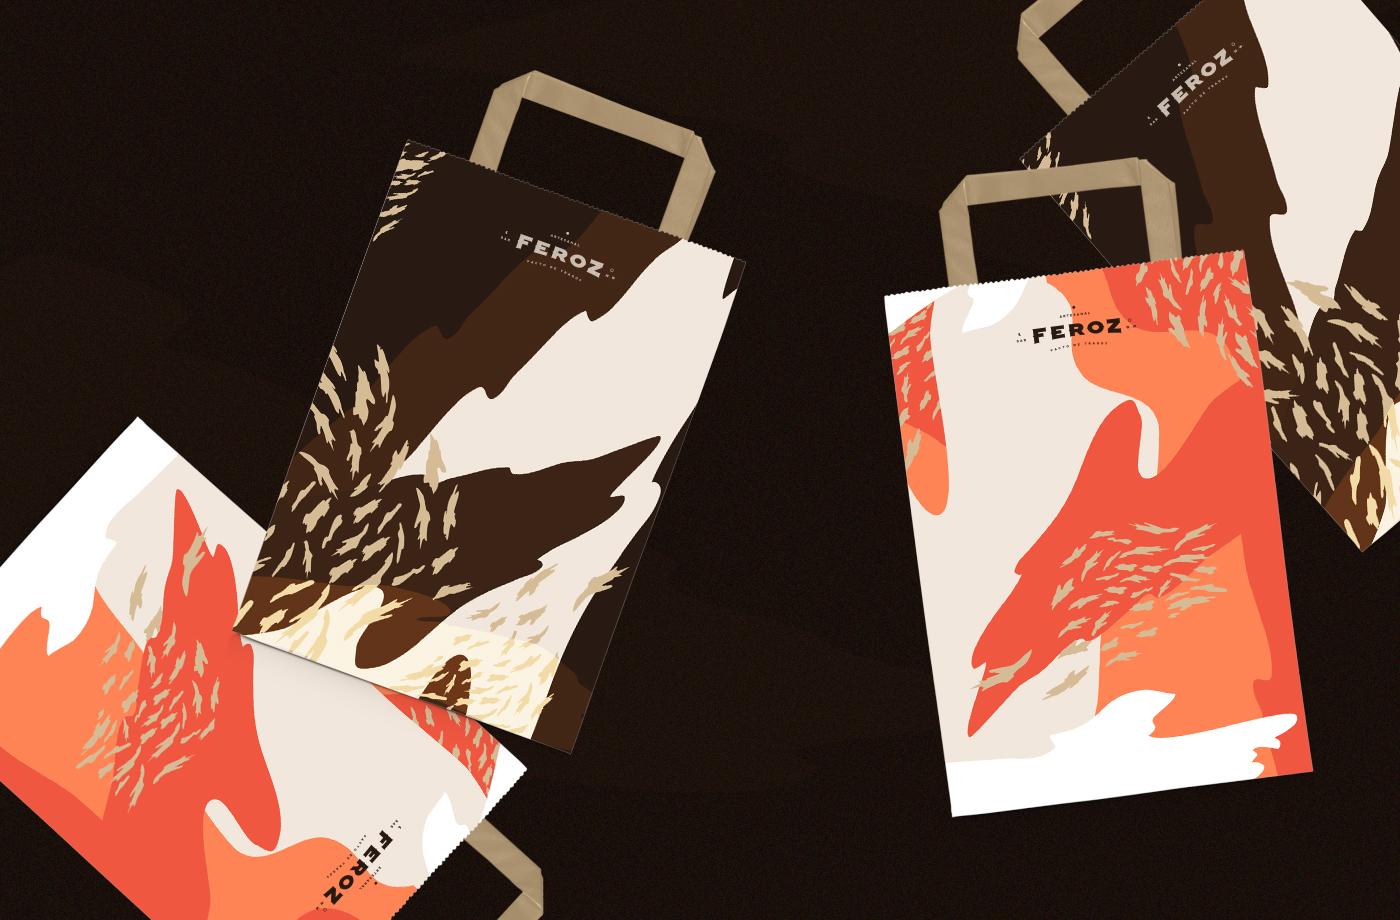 Shoppingbag-feroz.jpg